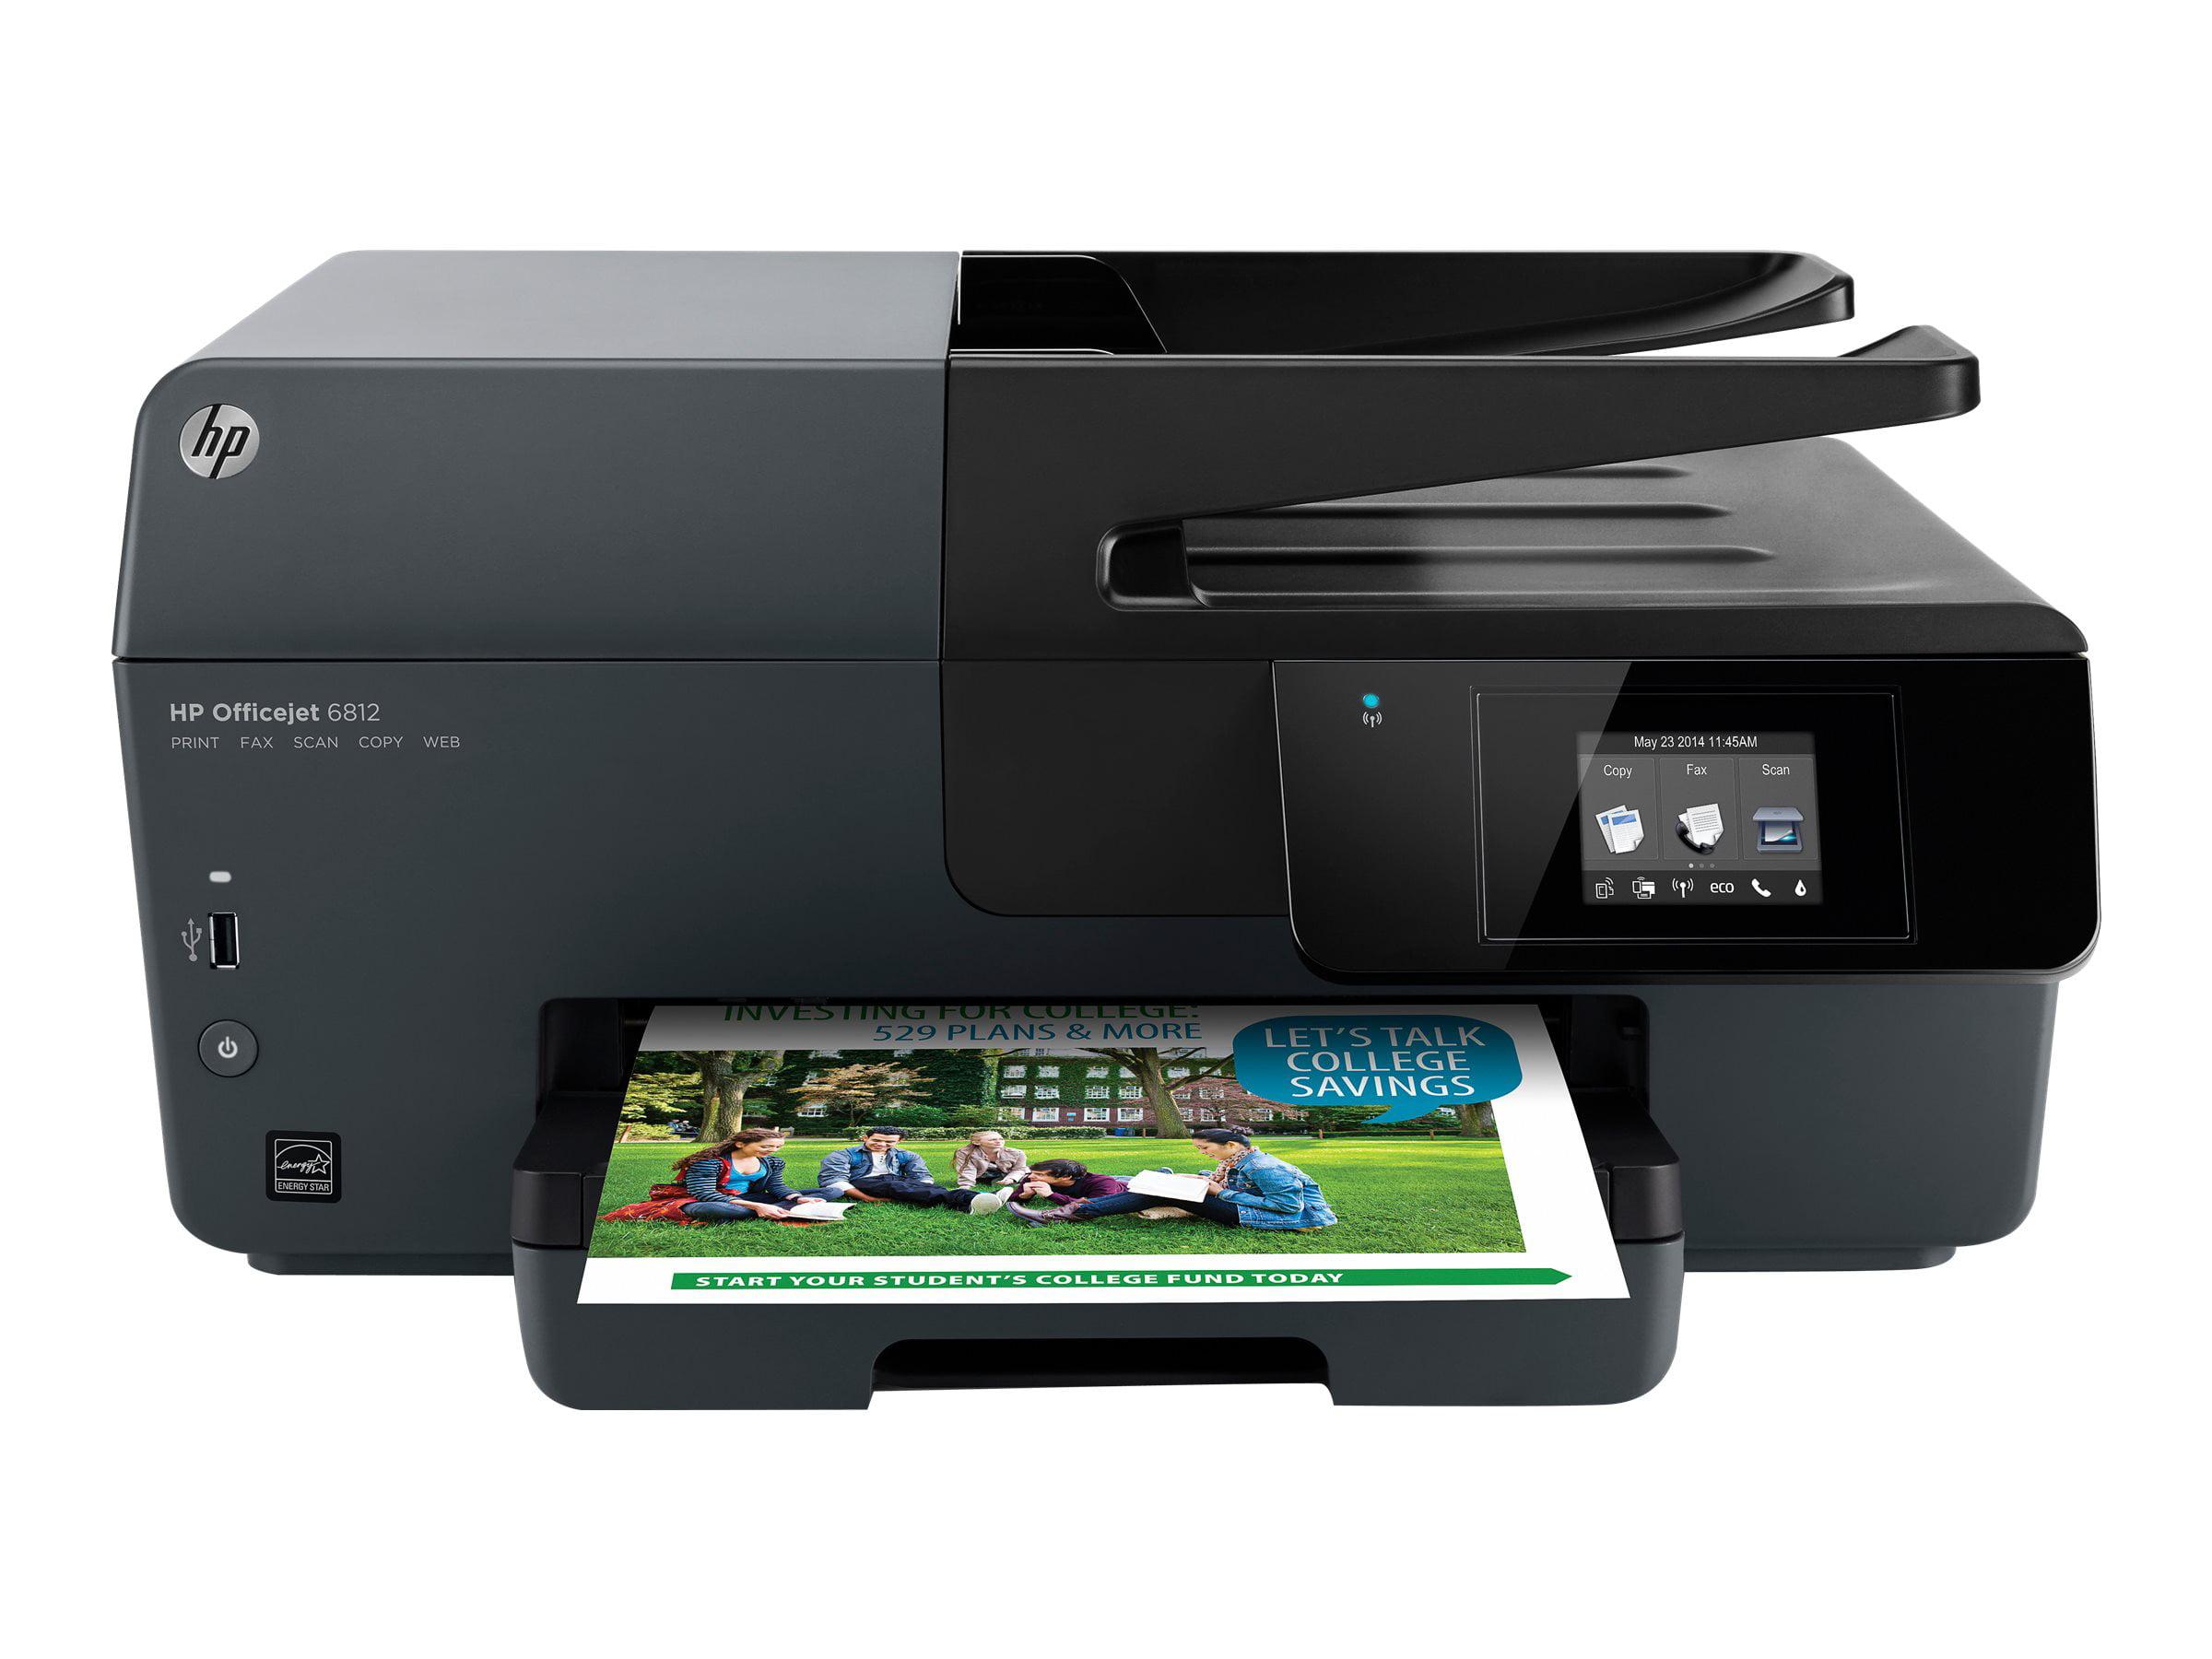 hp officejet 6812 e all in one printercopierscannerfax machine walmartcom